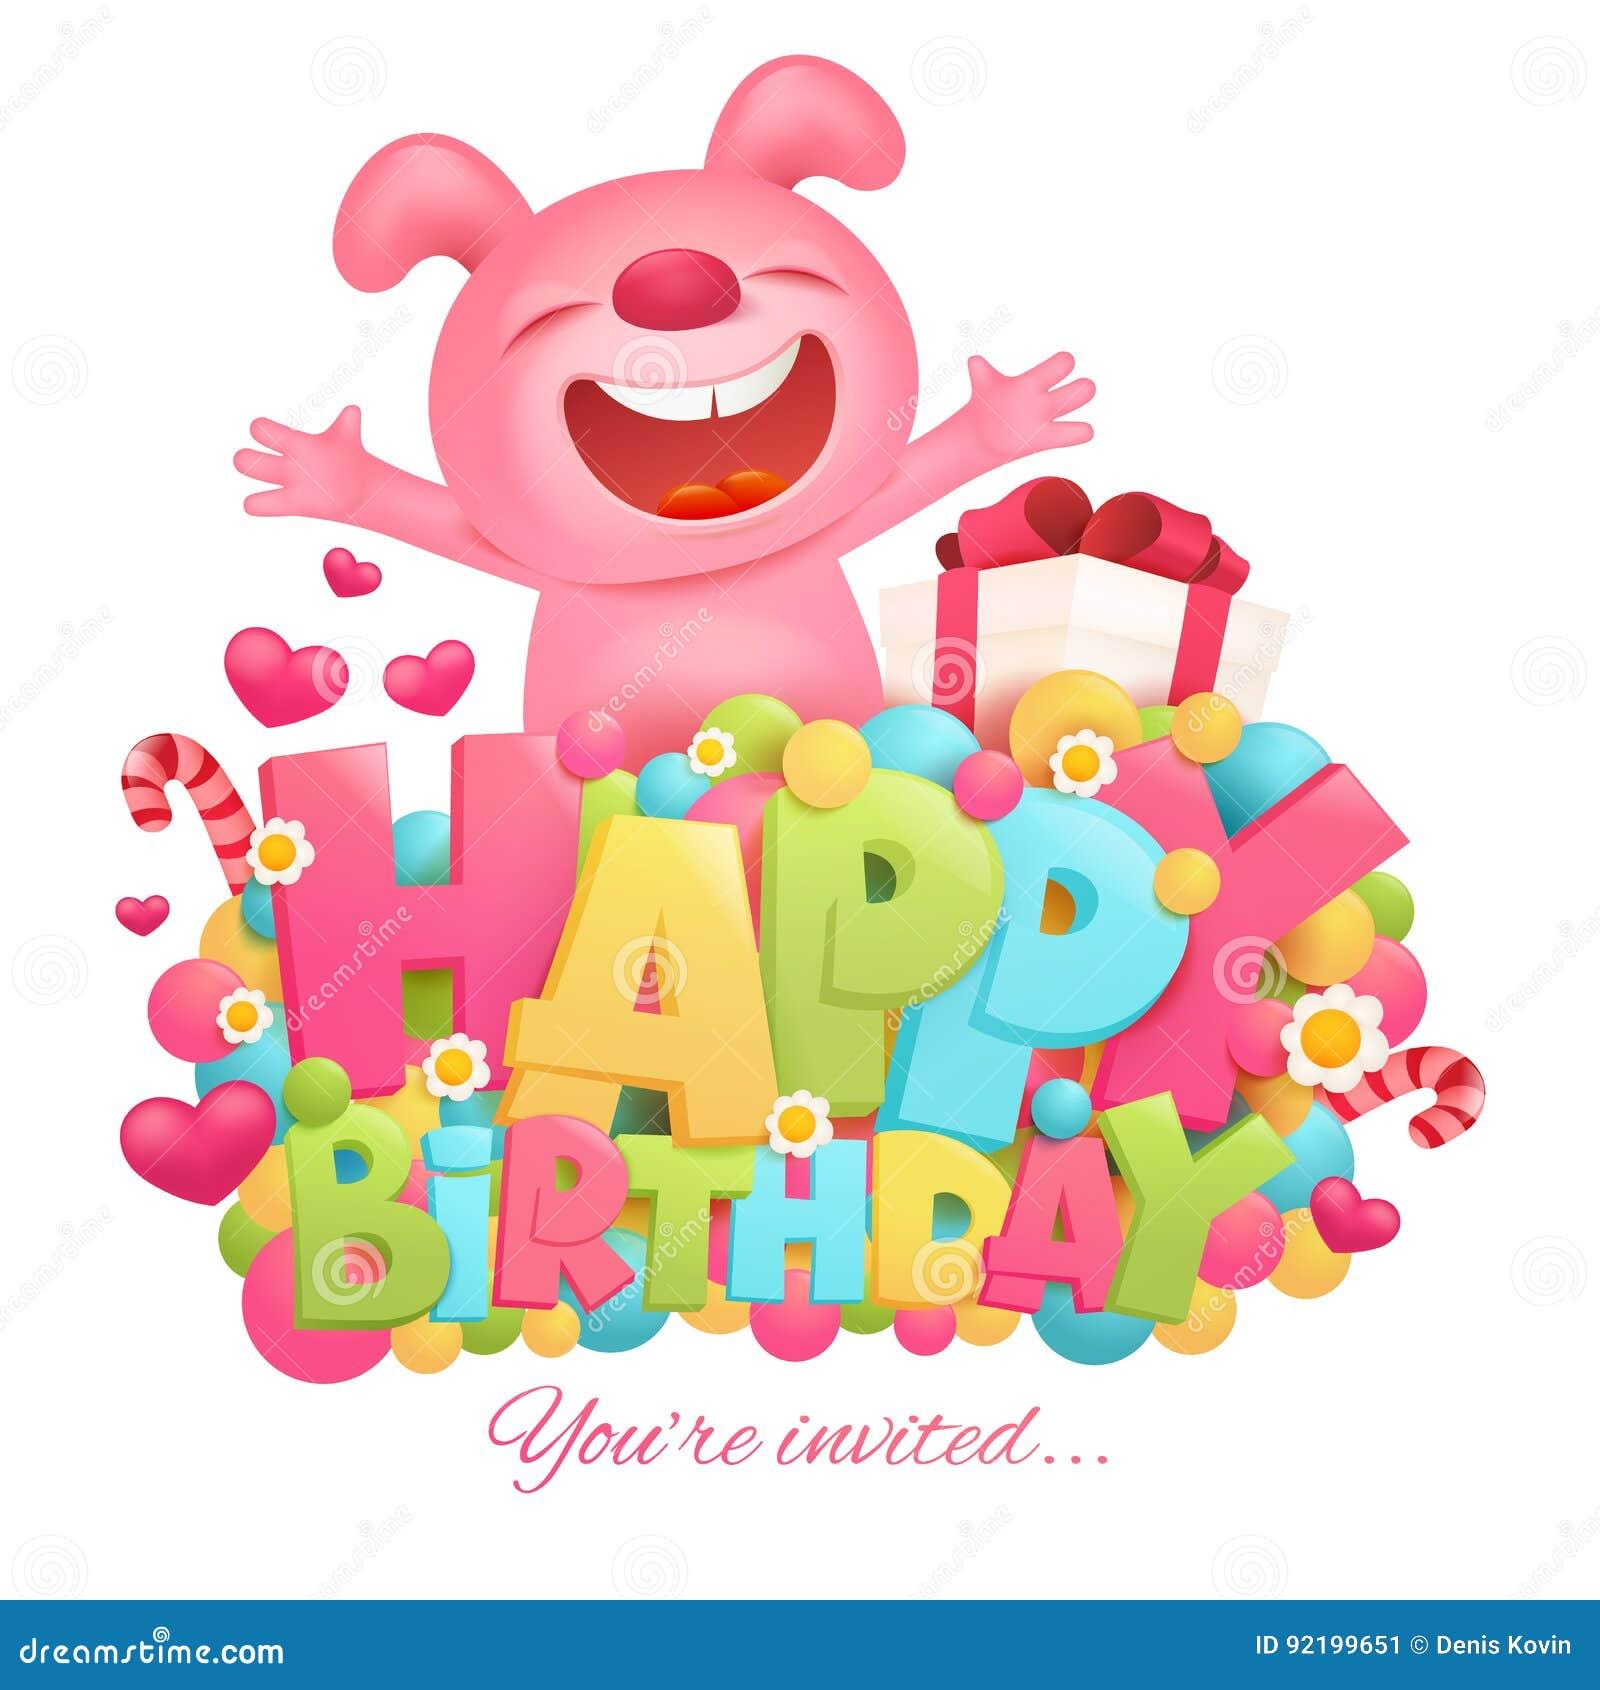 Happy Birthday Invitation Card Template With Toy Pink Bunny Emoji